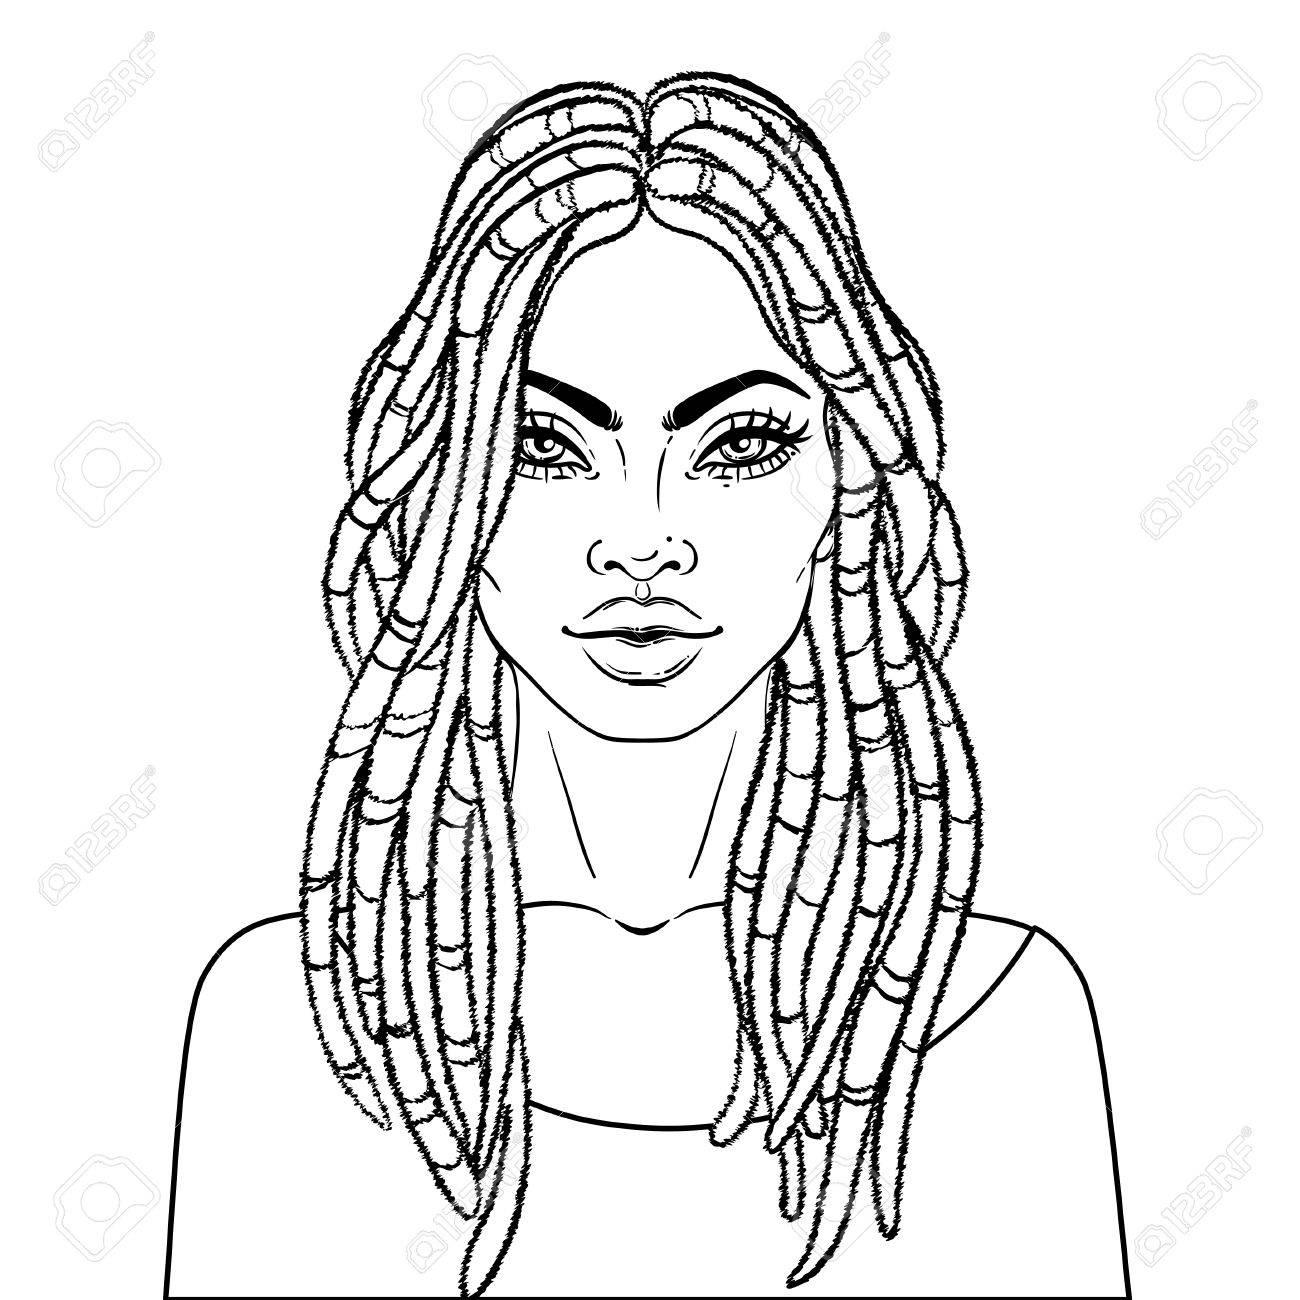 african american pretty girl vector illustration of black woman iPhone Emojis african american pretty girl vector illustration of black woman with dread locks glossy lips